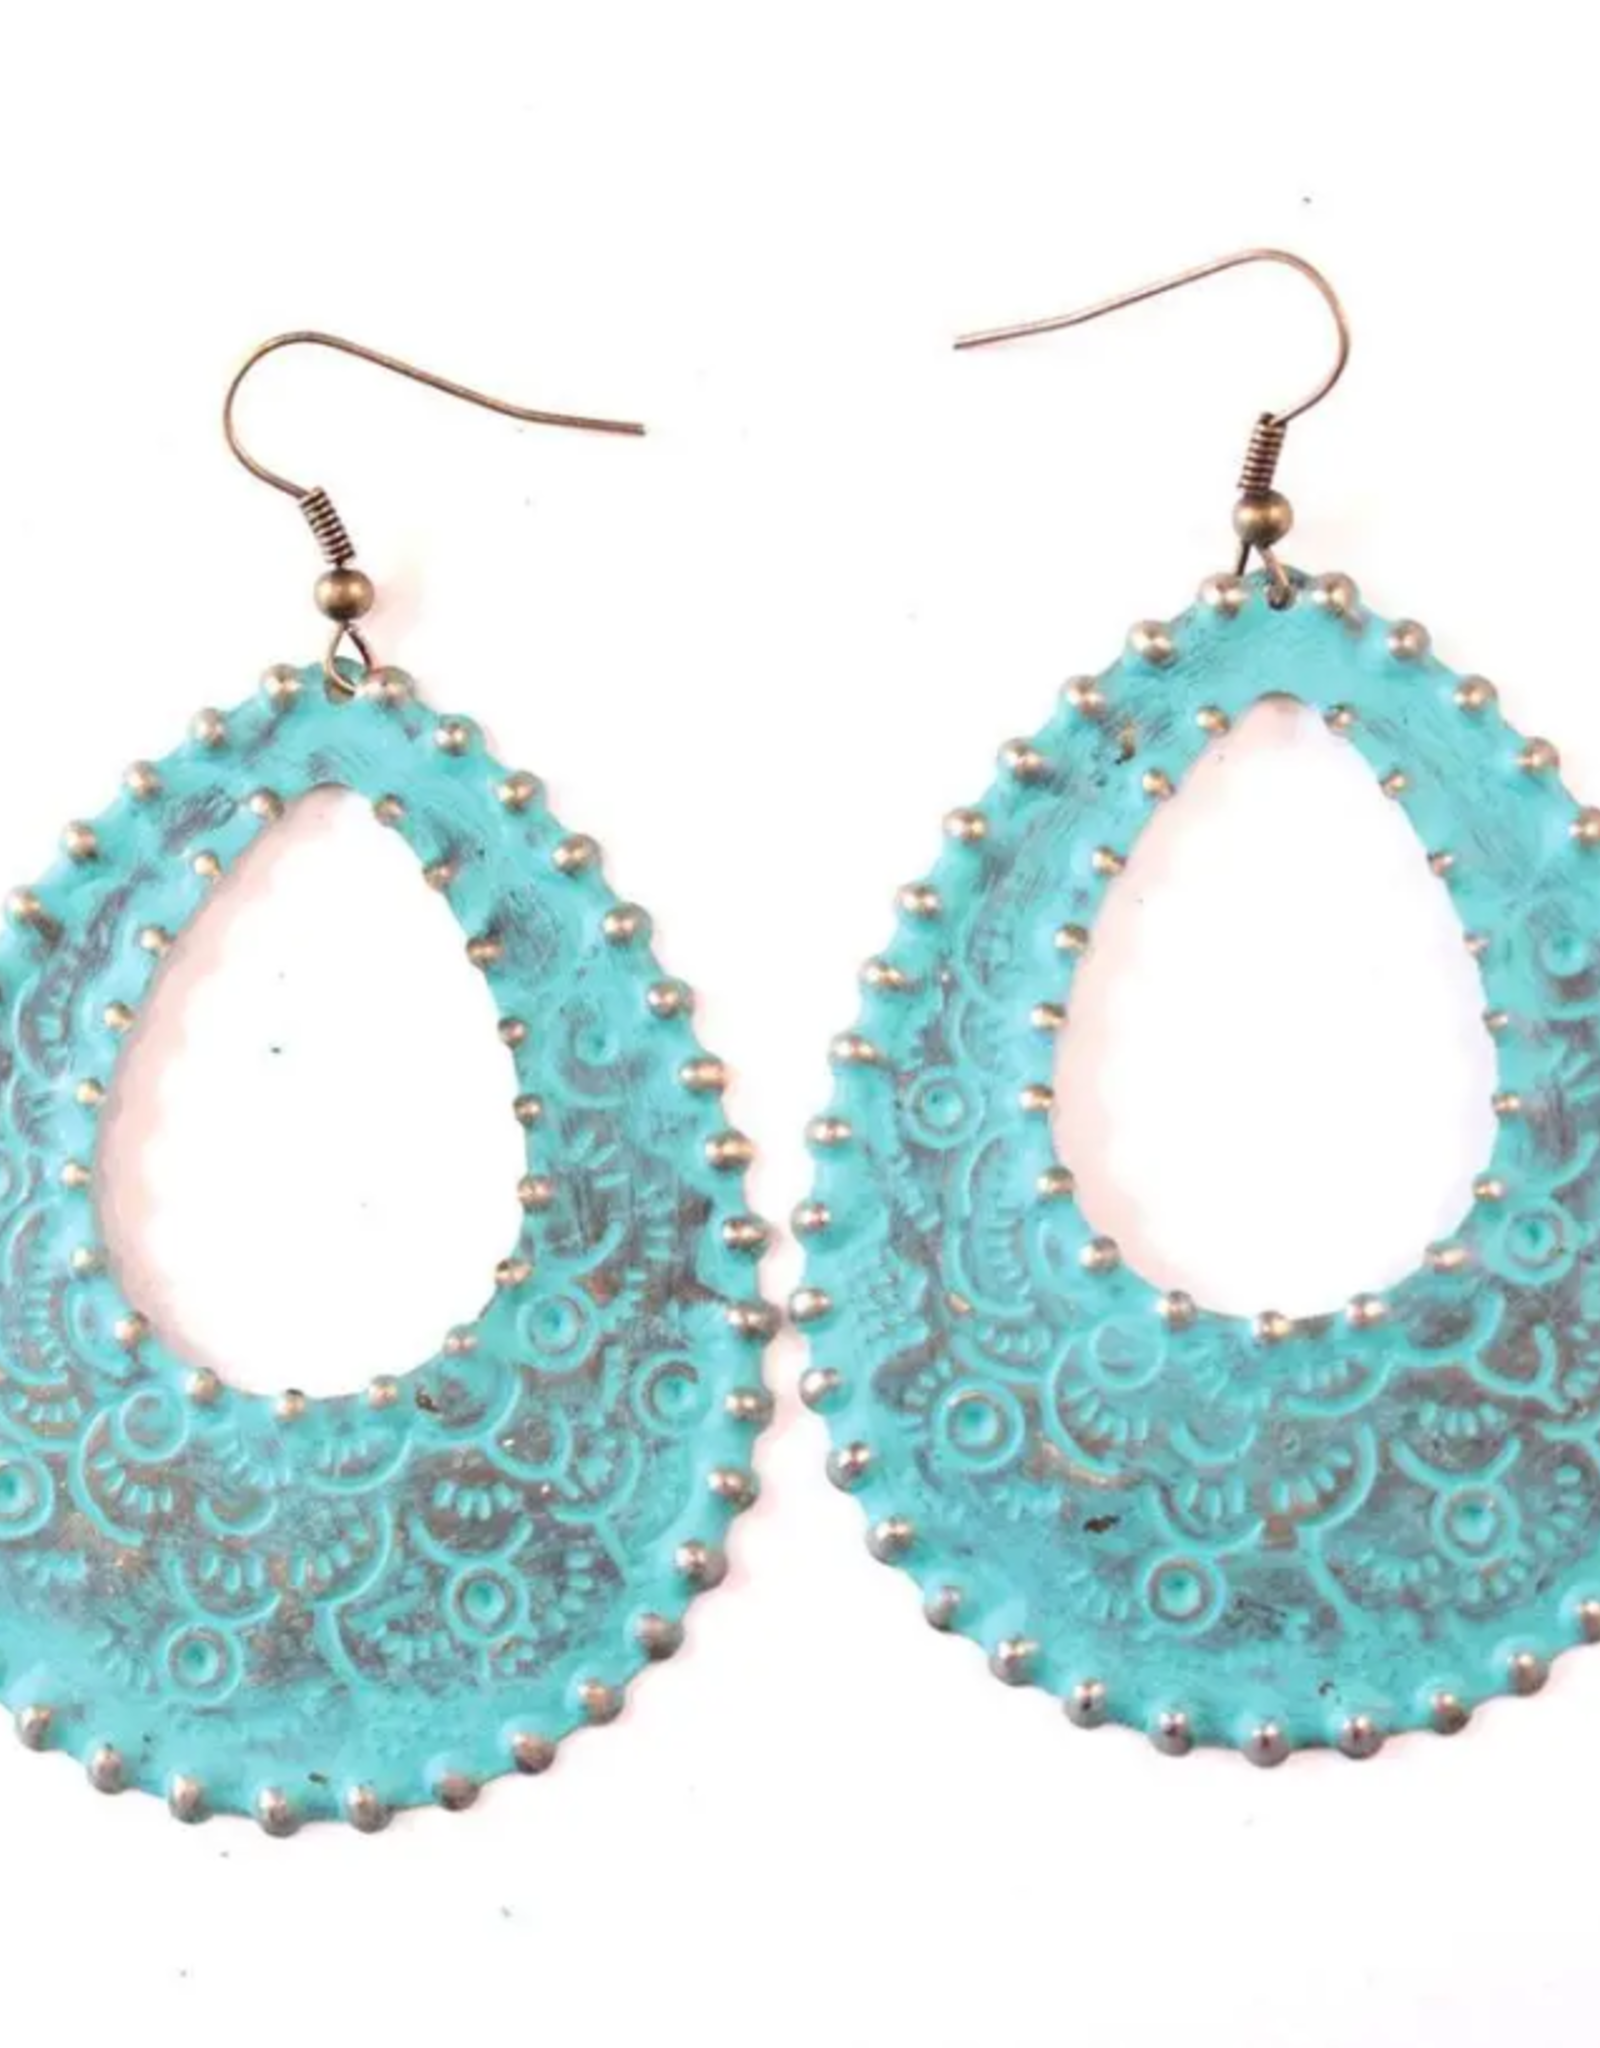 Gleeful Peacock Cowgirl Filigree earrings (turquoise)